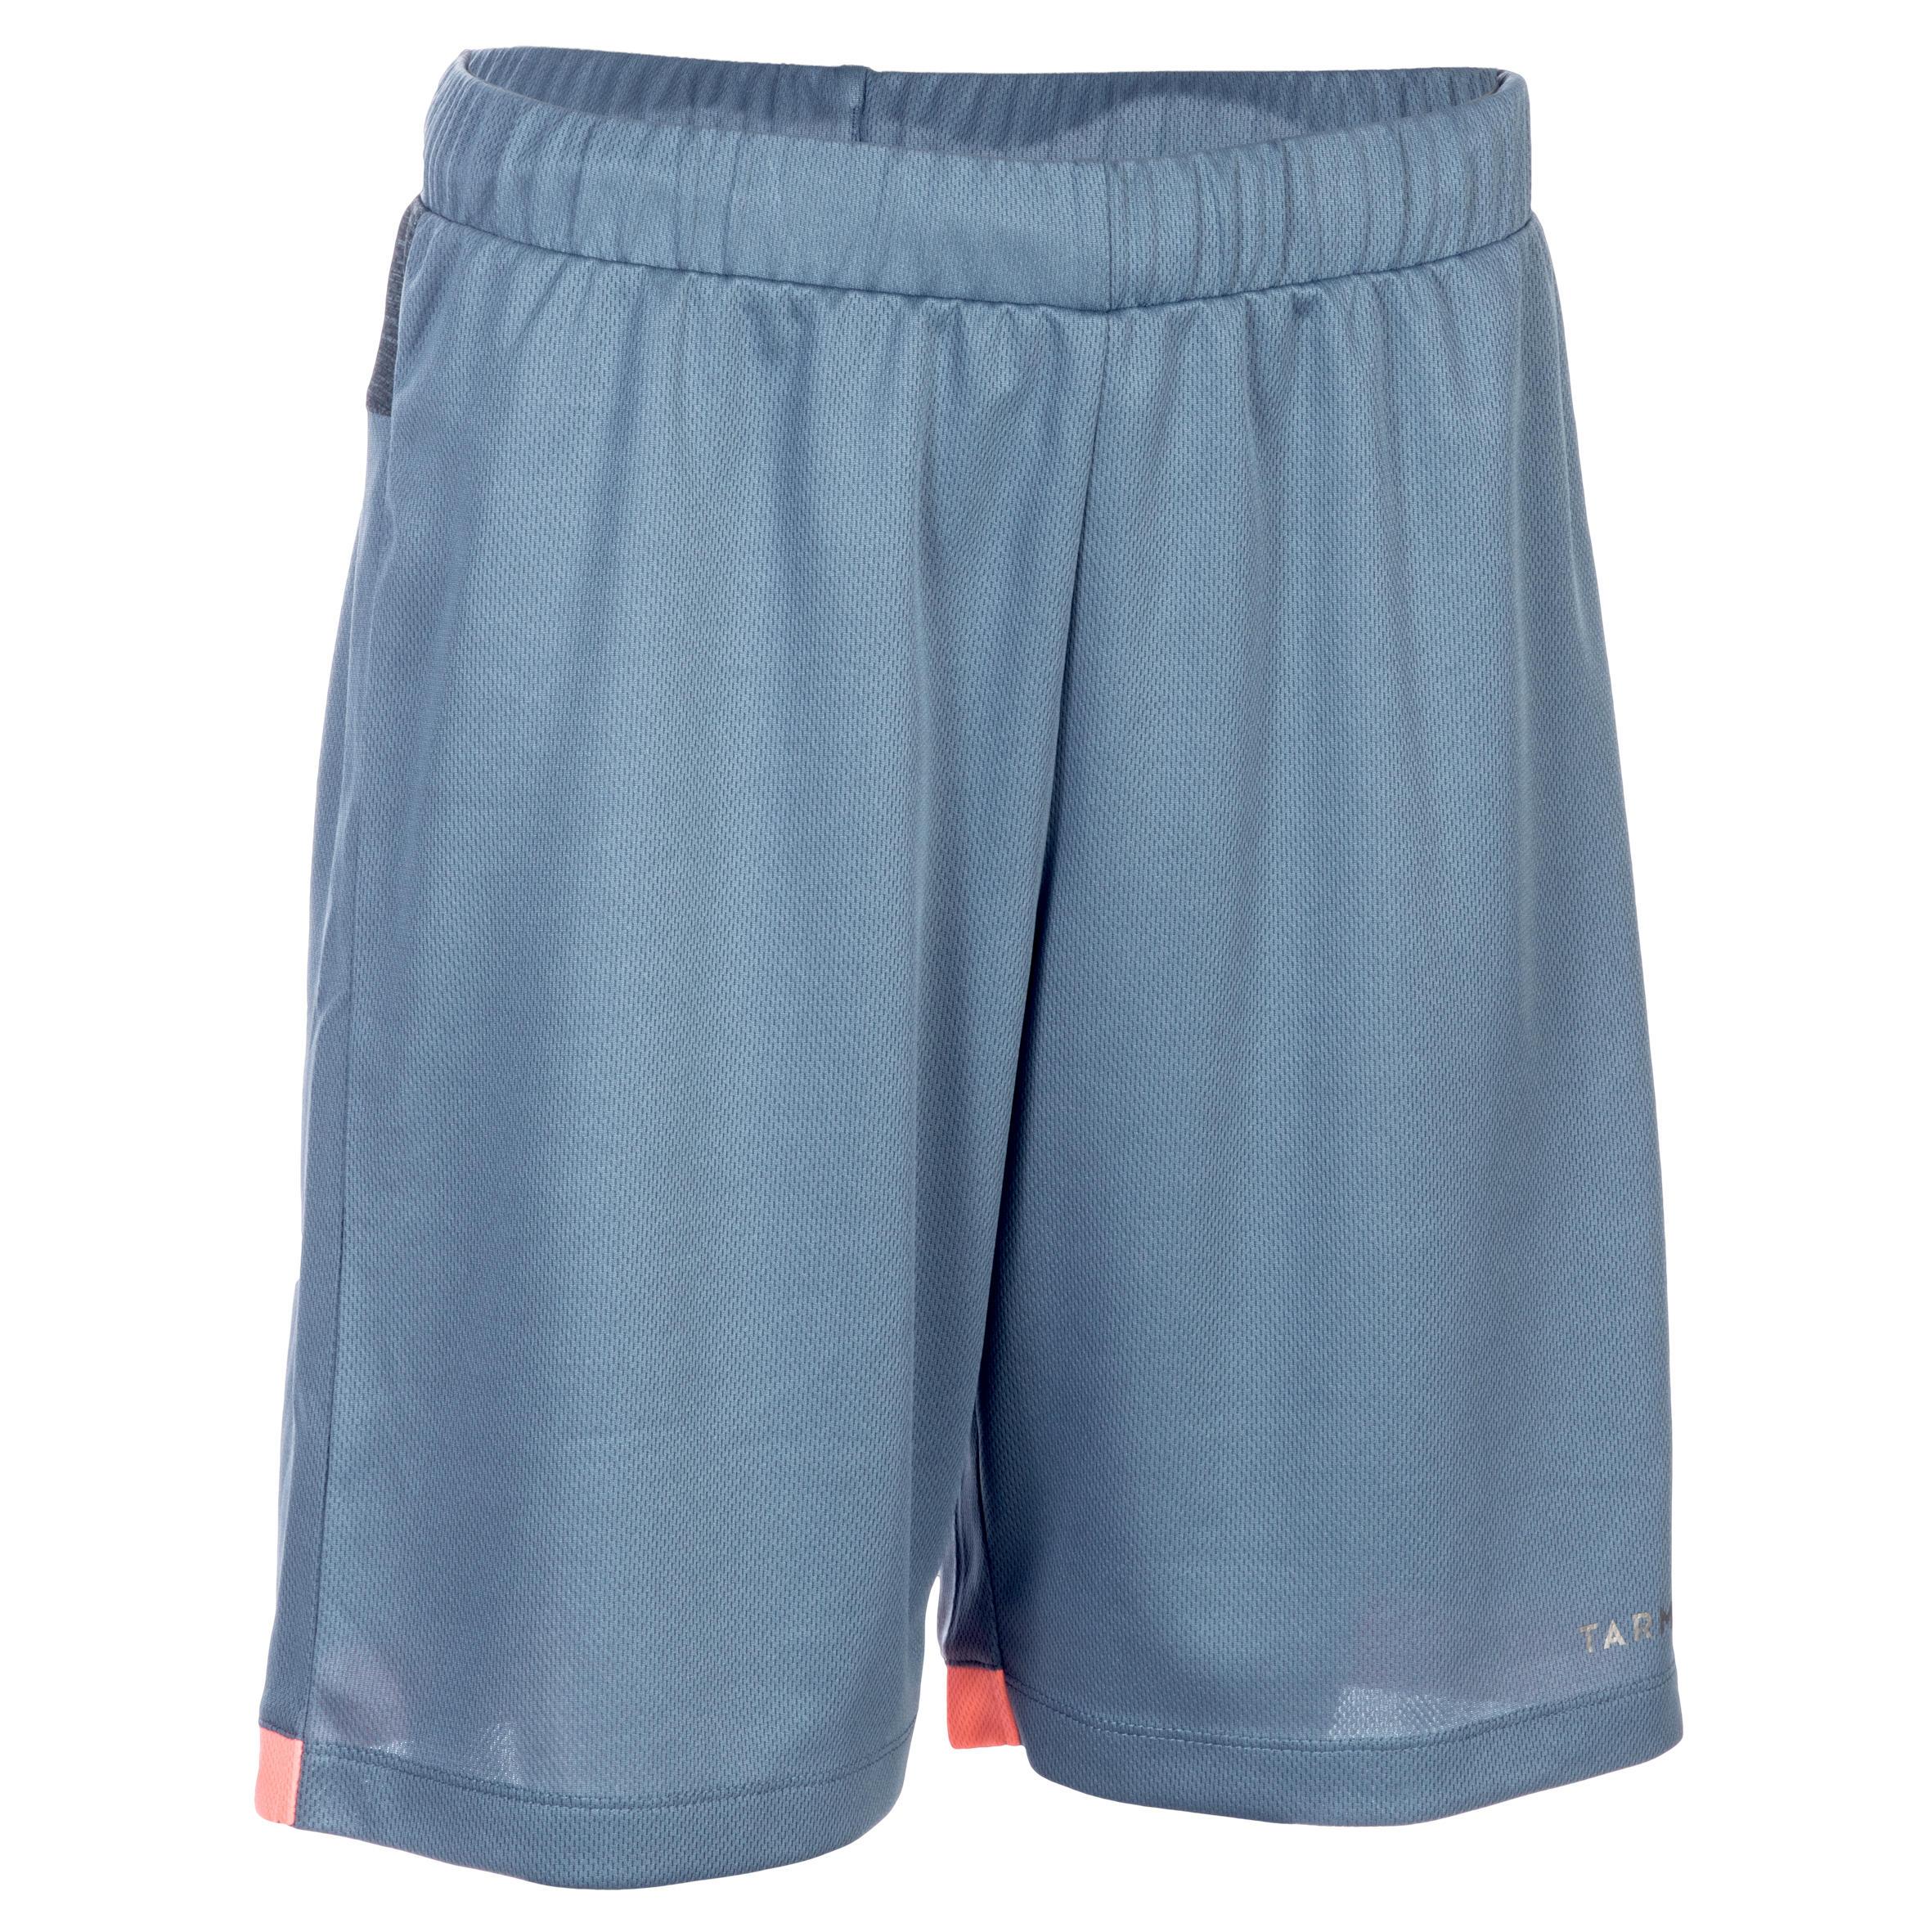 Basketballshorts SH500 Damen Fortgeschrittene grau/rosa   Sportbekleidung > Sporthosen > Basketballshorts   Grau - Blau - Rot - Rosa   Tarmak